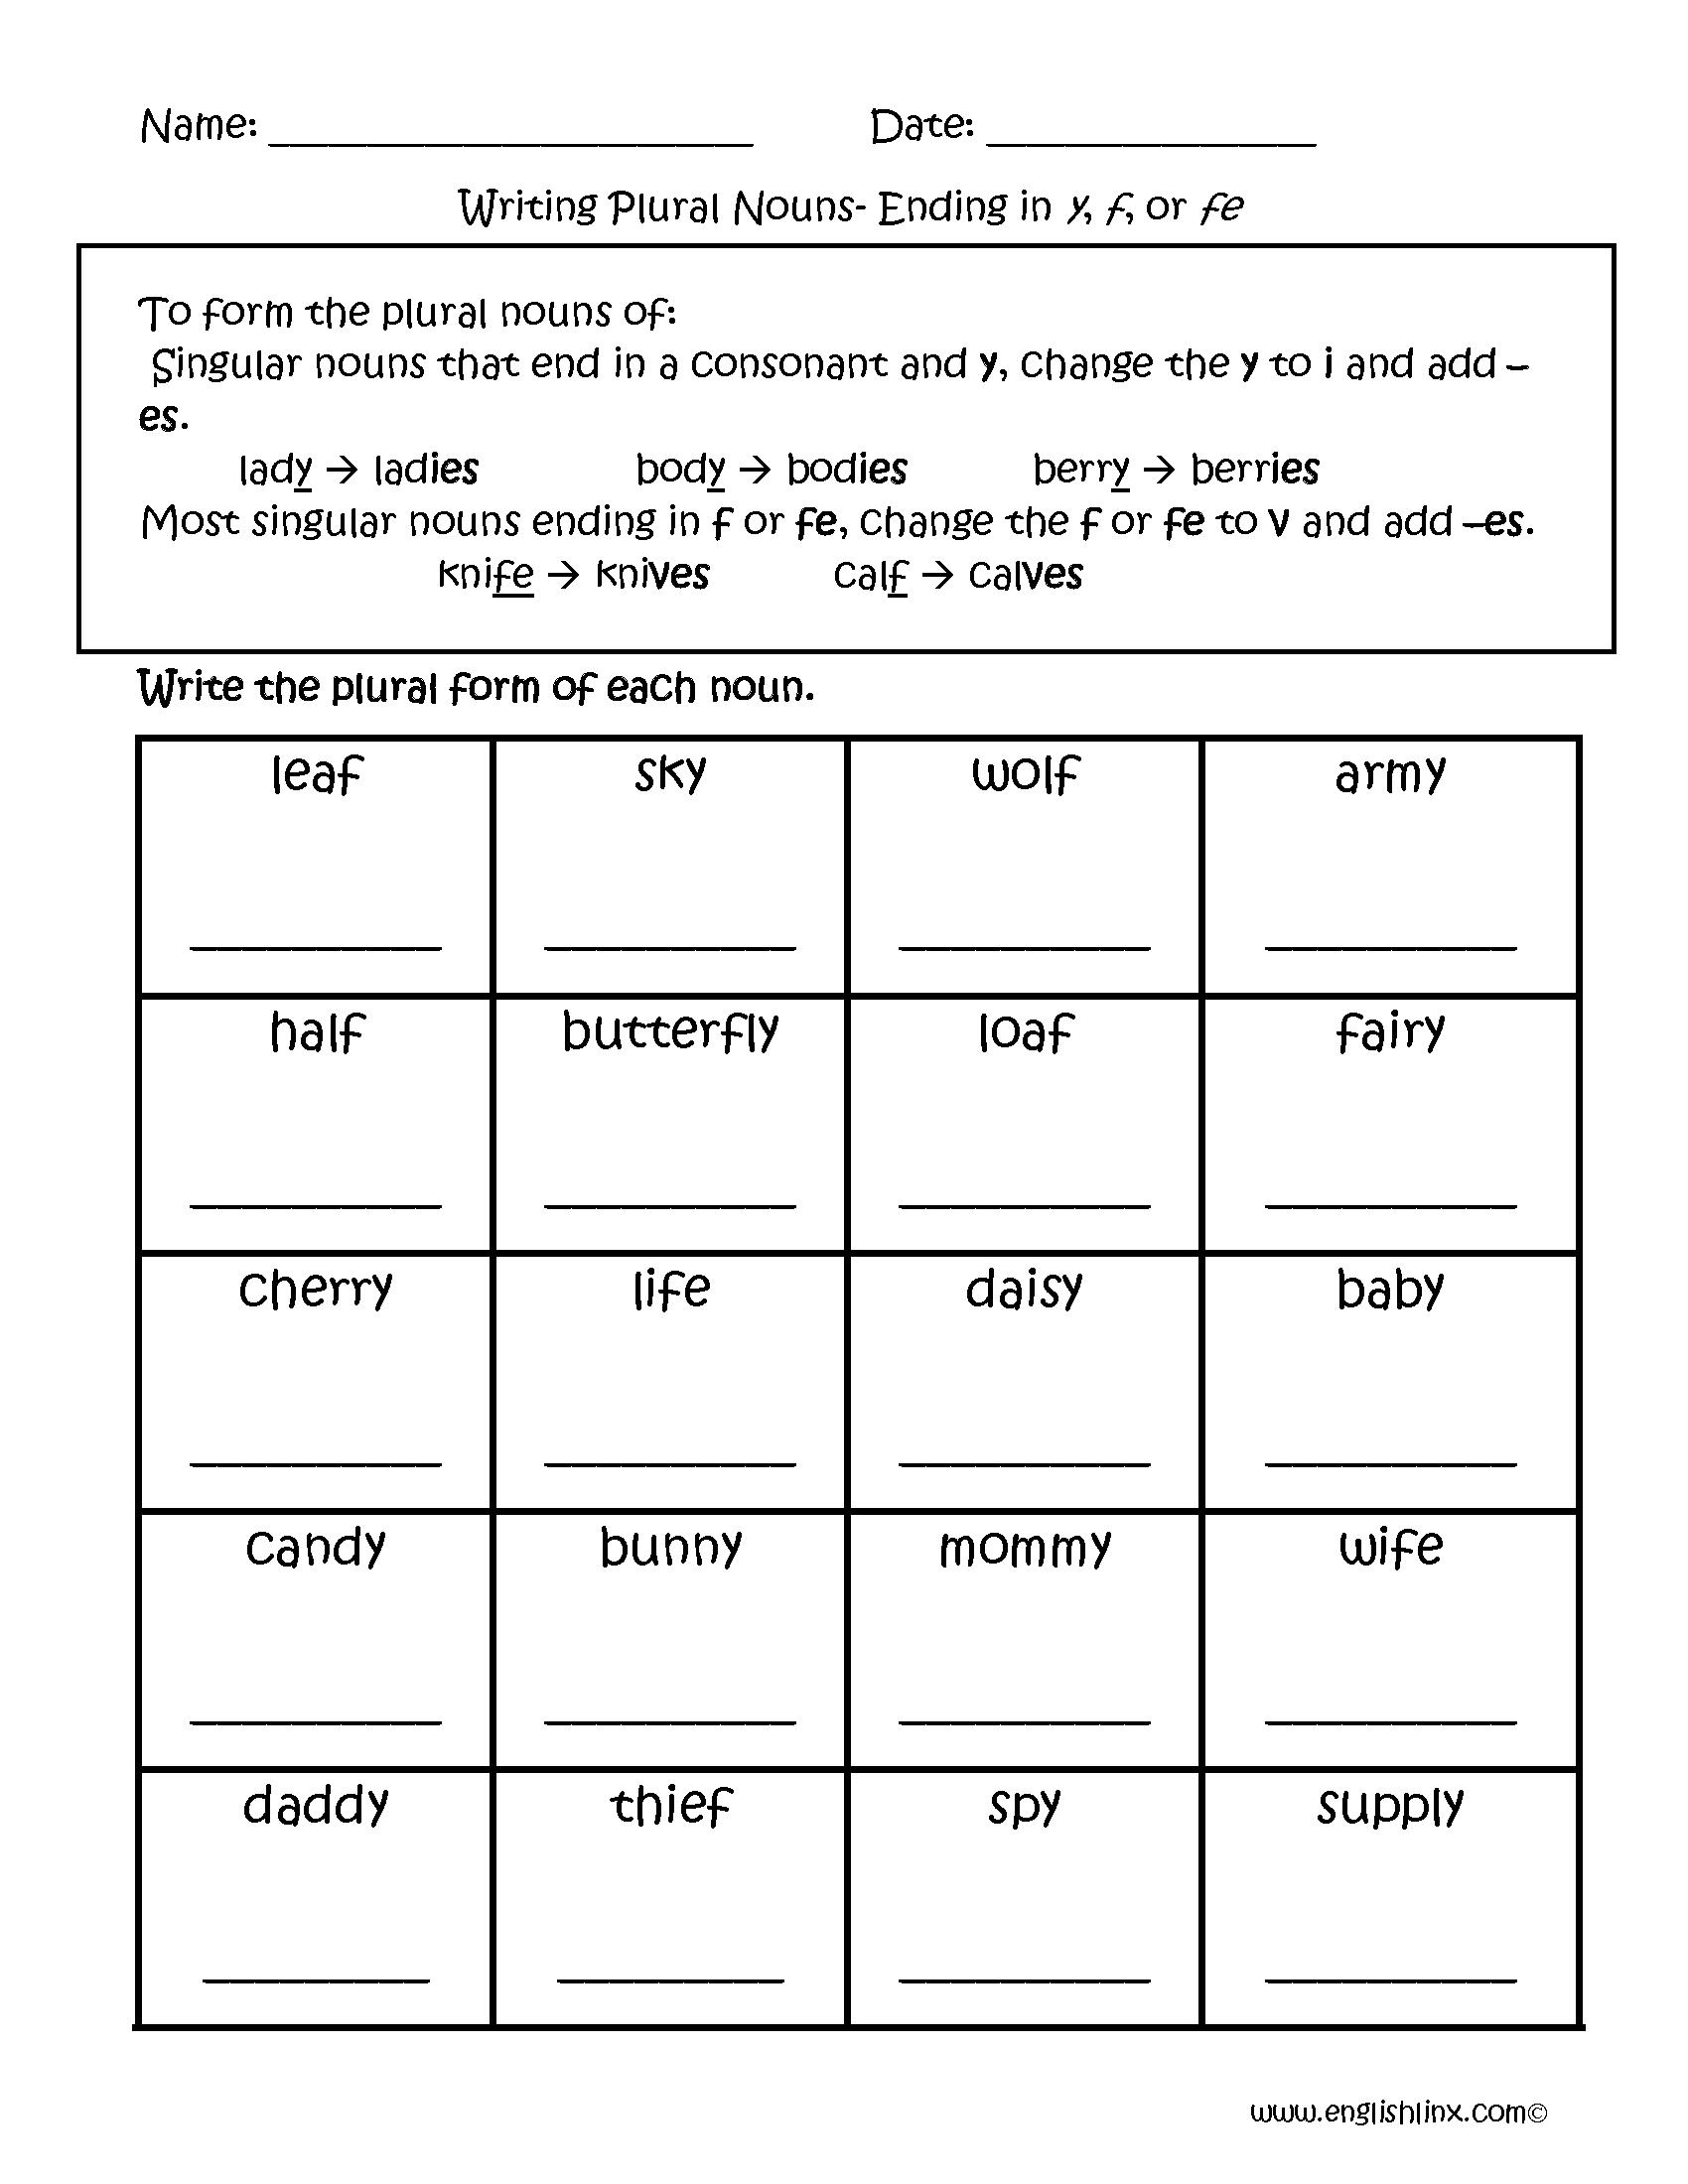 Singular and Plural Nouns Worksheets | Writing Plural Nouns Worksheets